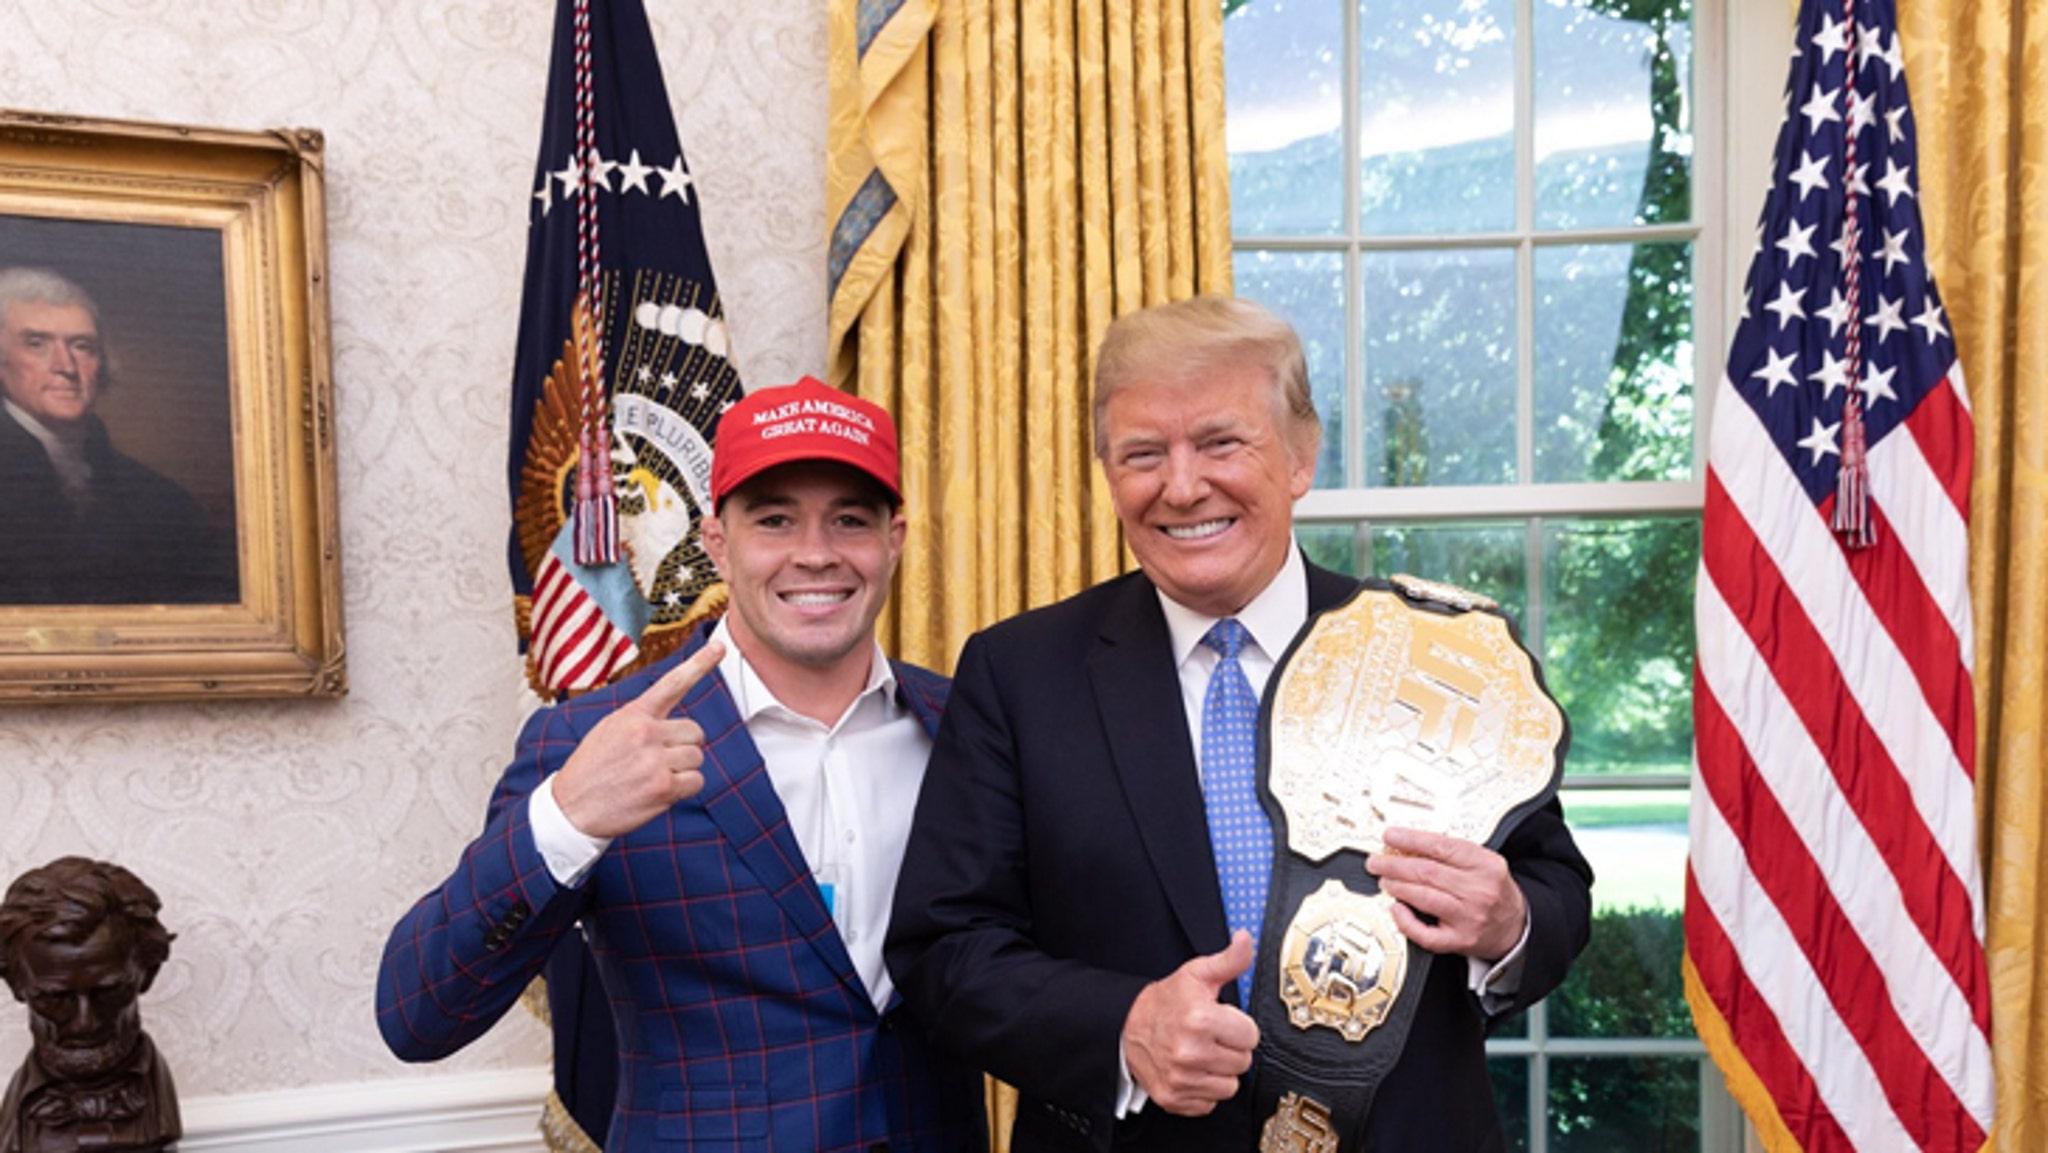 Colby Covington Visits White House Unlike The Filth A Delphia Eagles